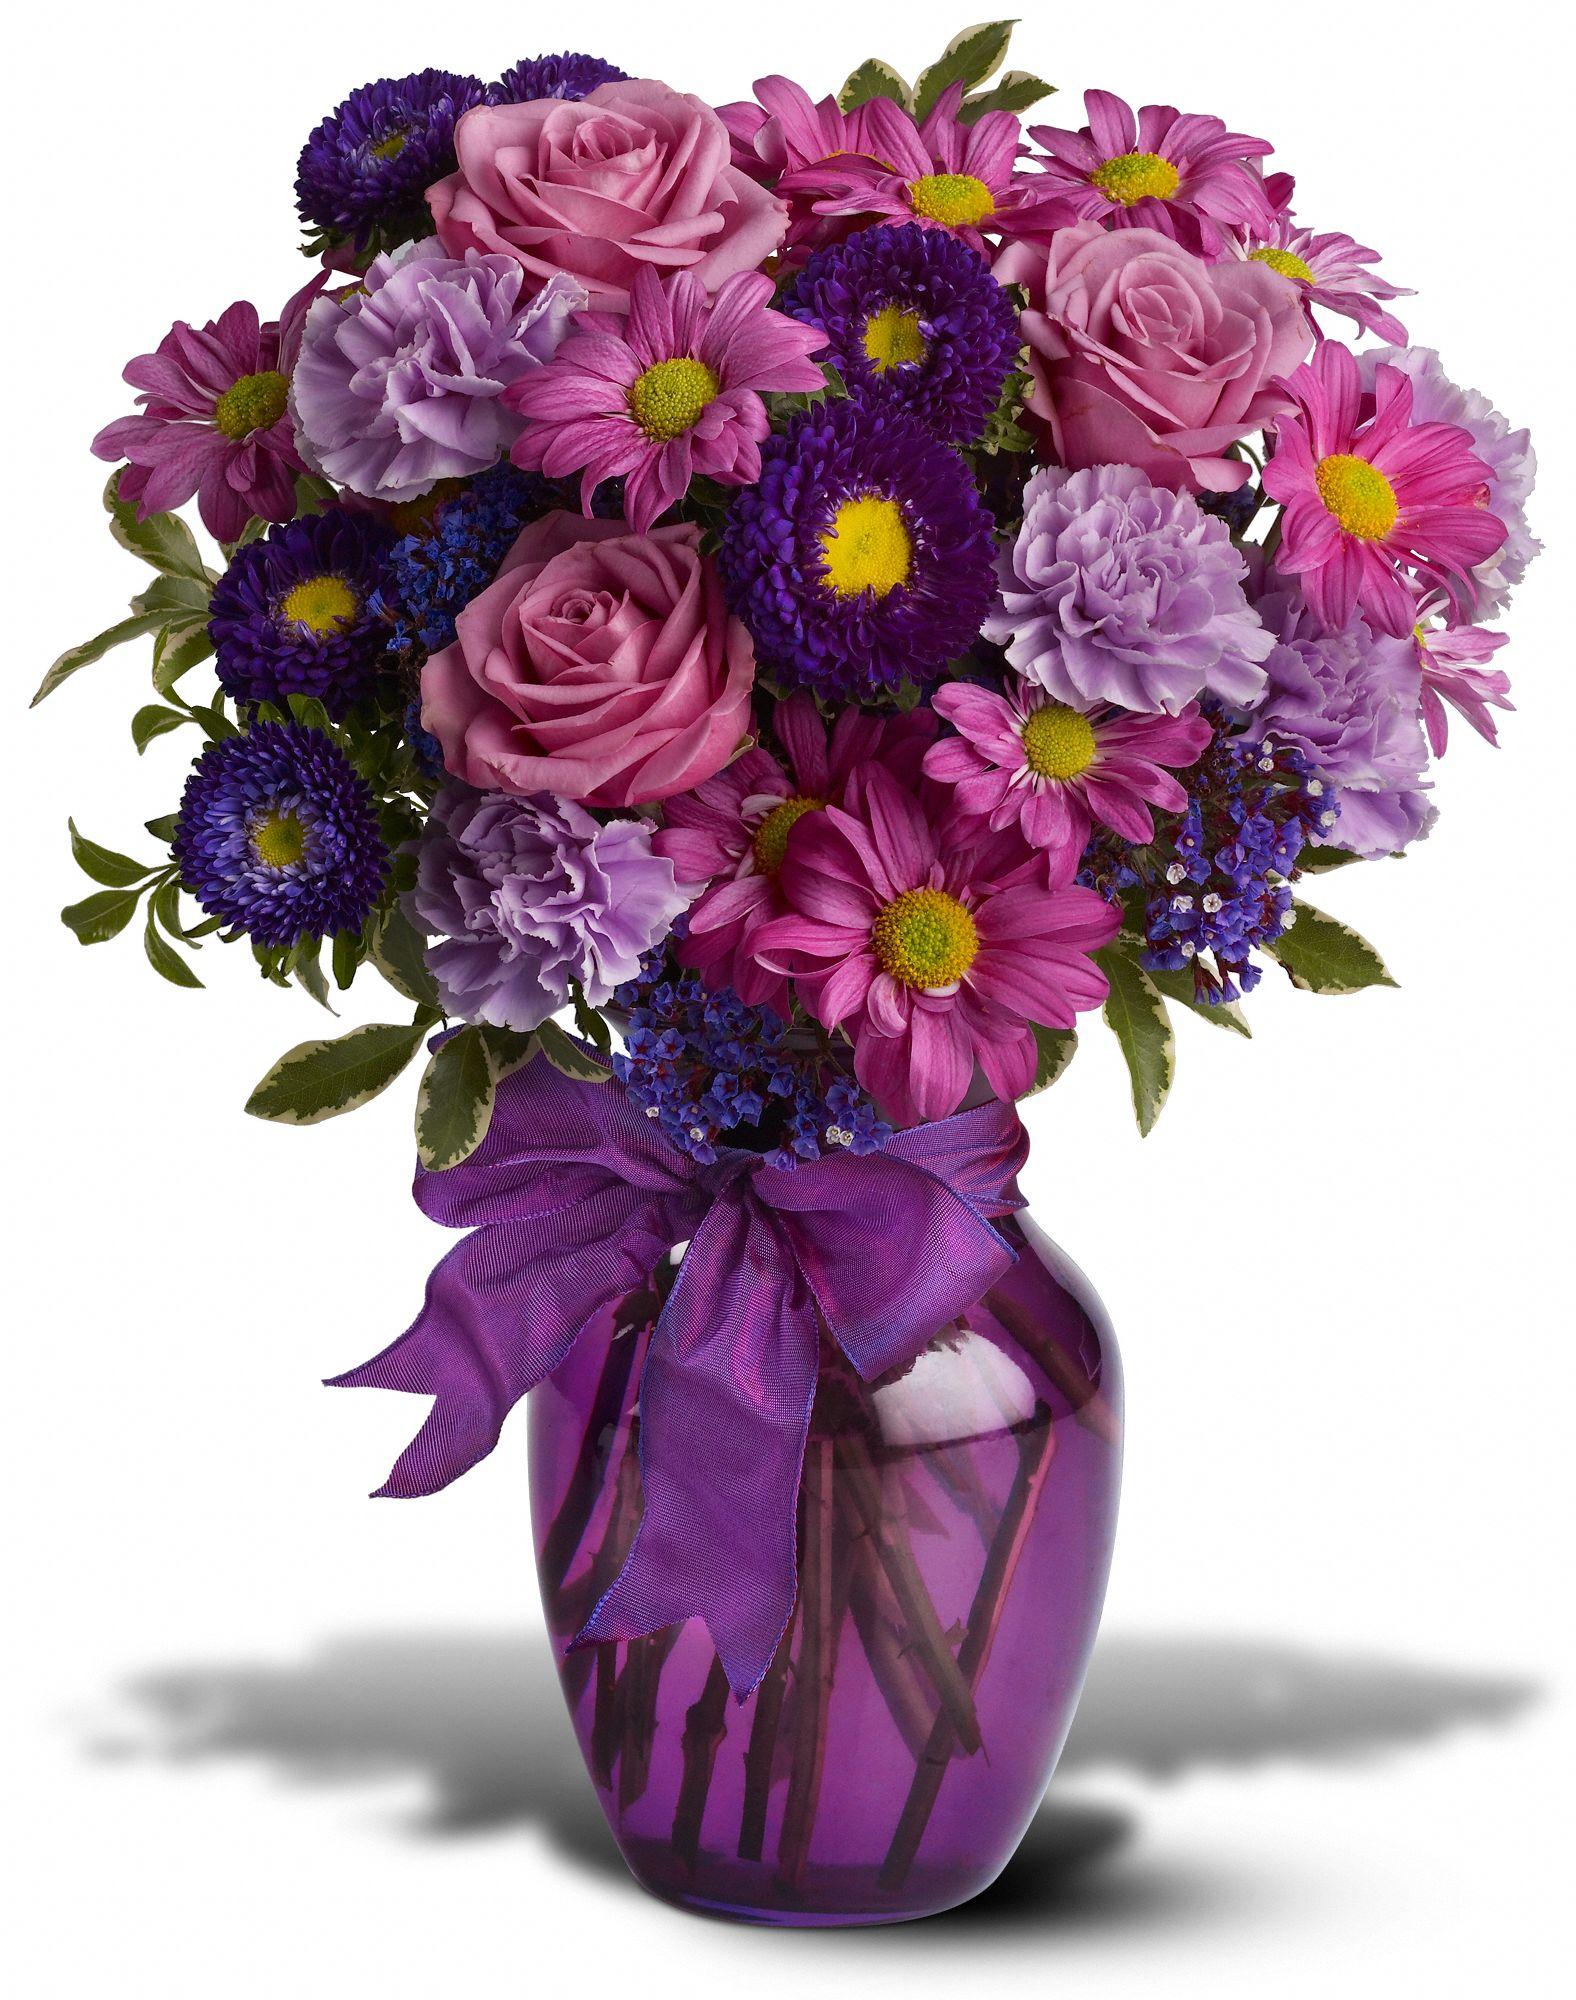 Everlasting Lavender Flower Bouquet